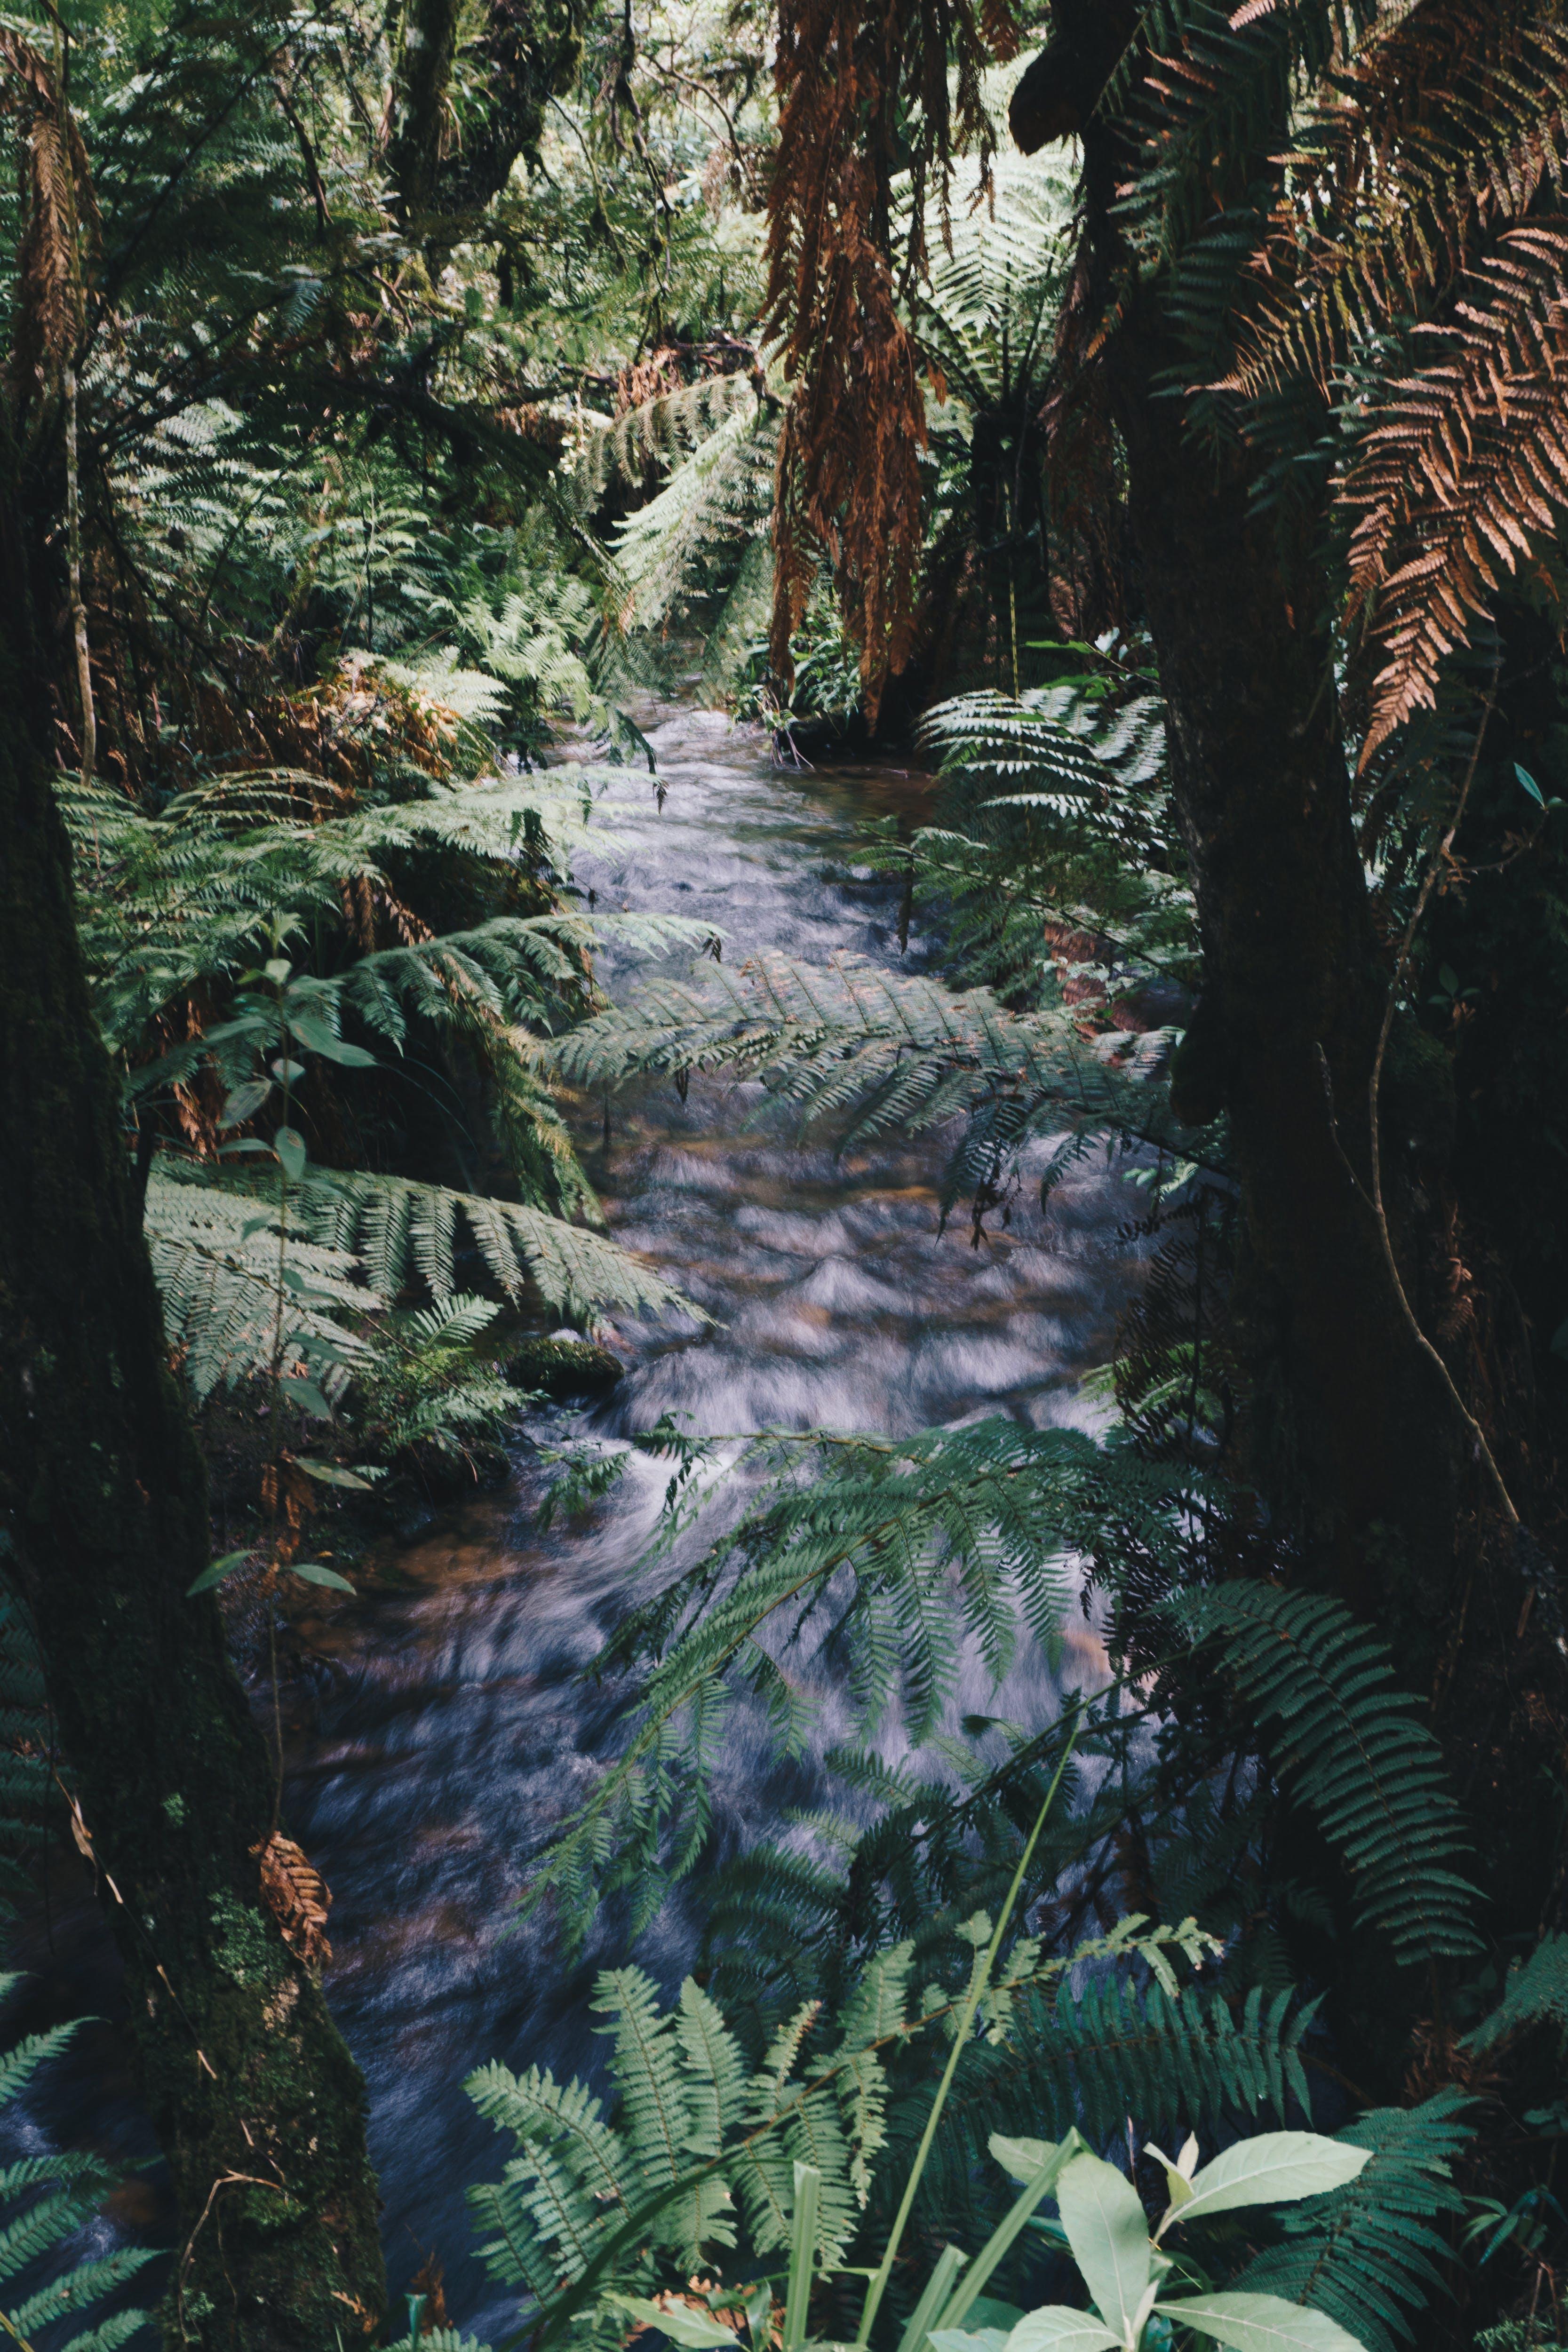 Kostenloses Stock Foto zu bäume, farn, fließen, friedlich